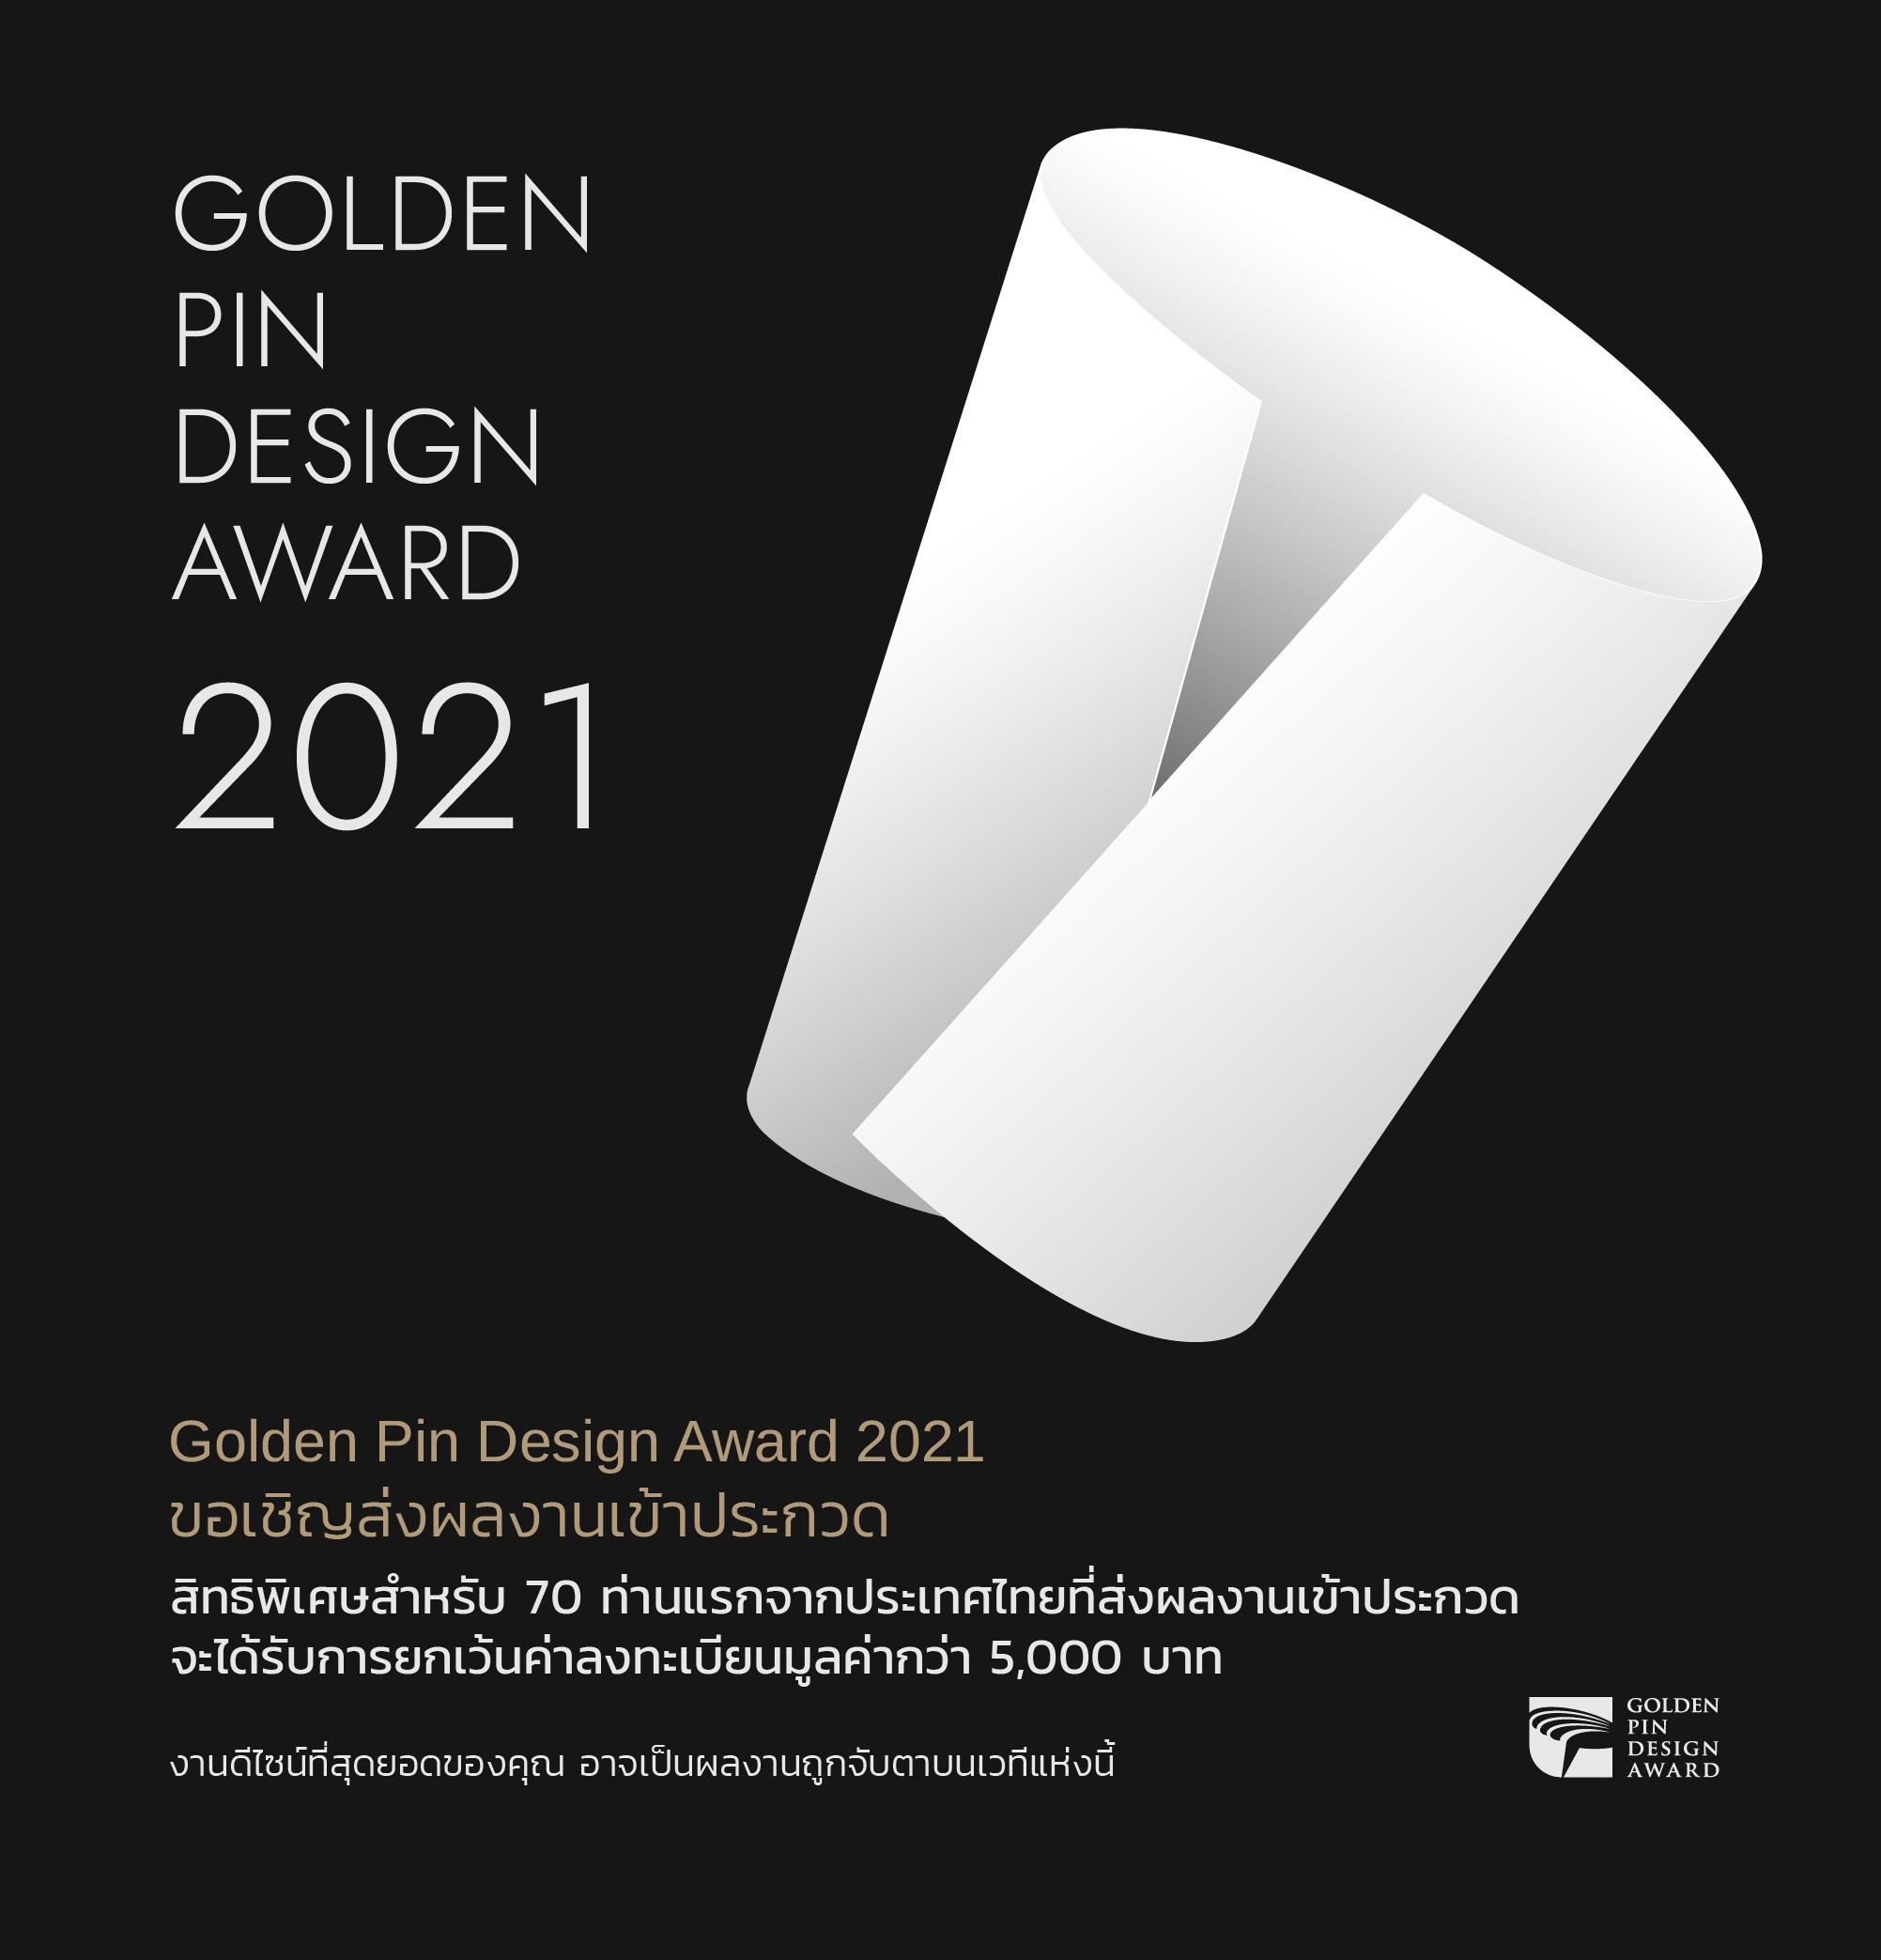 Golden Pin Design Award 2021